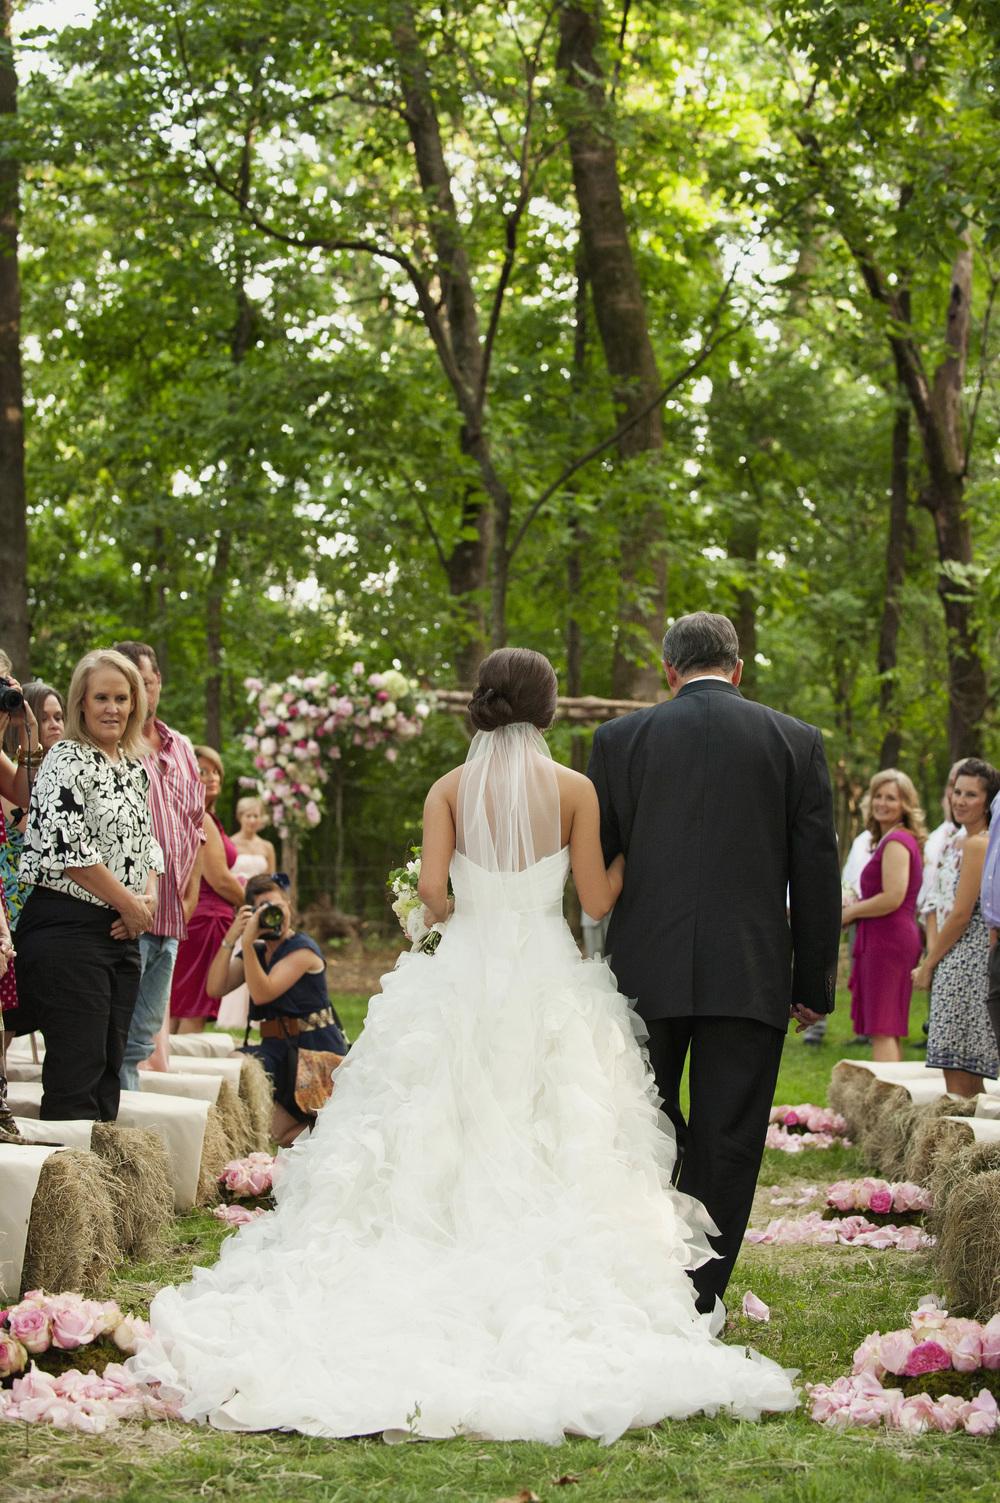 jessica-zimmerman-events-floral-event-design-coordination-planning-wedding-invitations-neutral-blush-silk-ribbon-organic-bouquet-conway-arkansas-bailey-hepp-pink-outdoor-wedding-ceremony